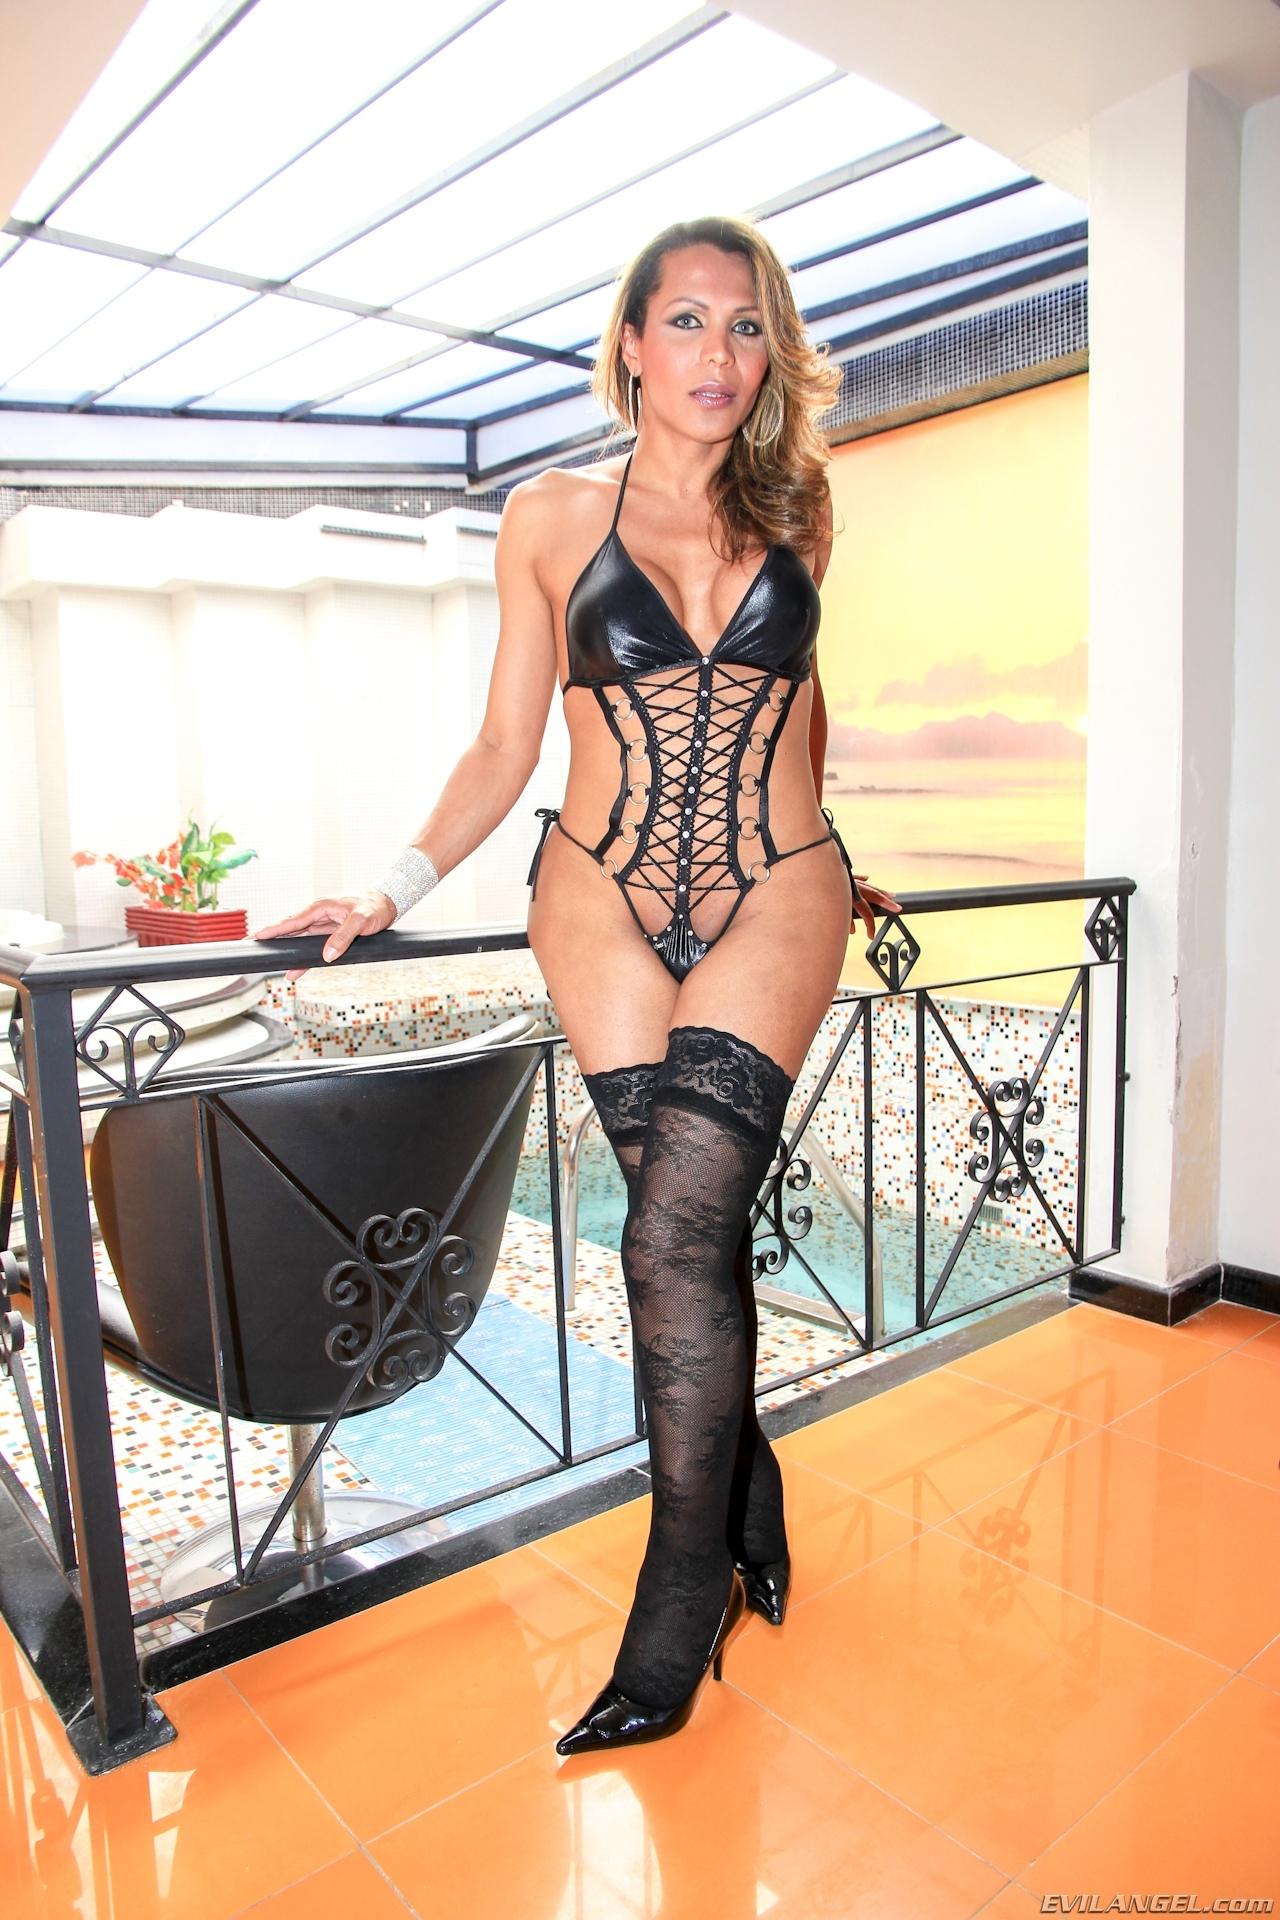 Carla Araujo In Inviting Wear On The Balcony Exposing Her Bubble Ass-Hole